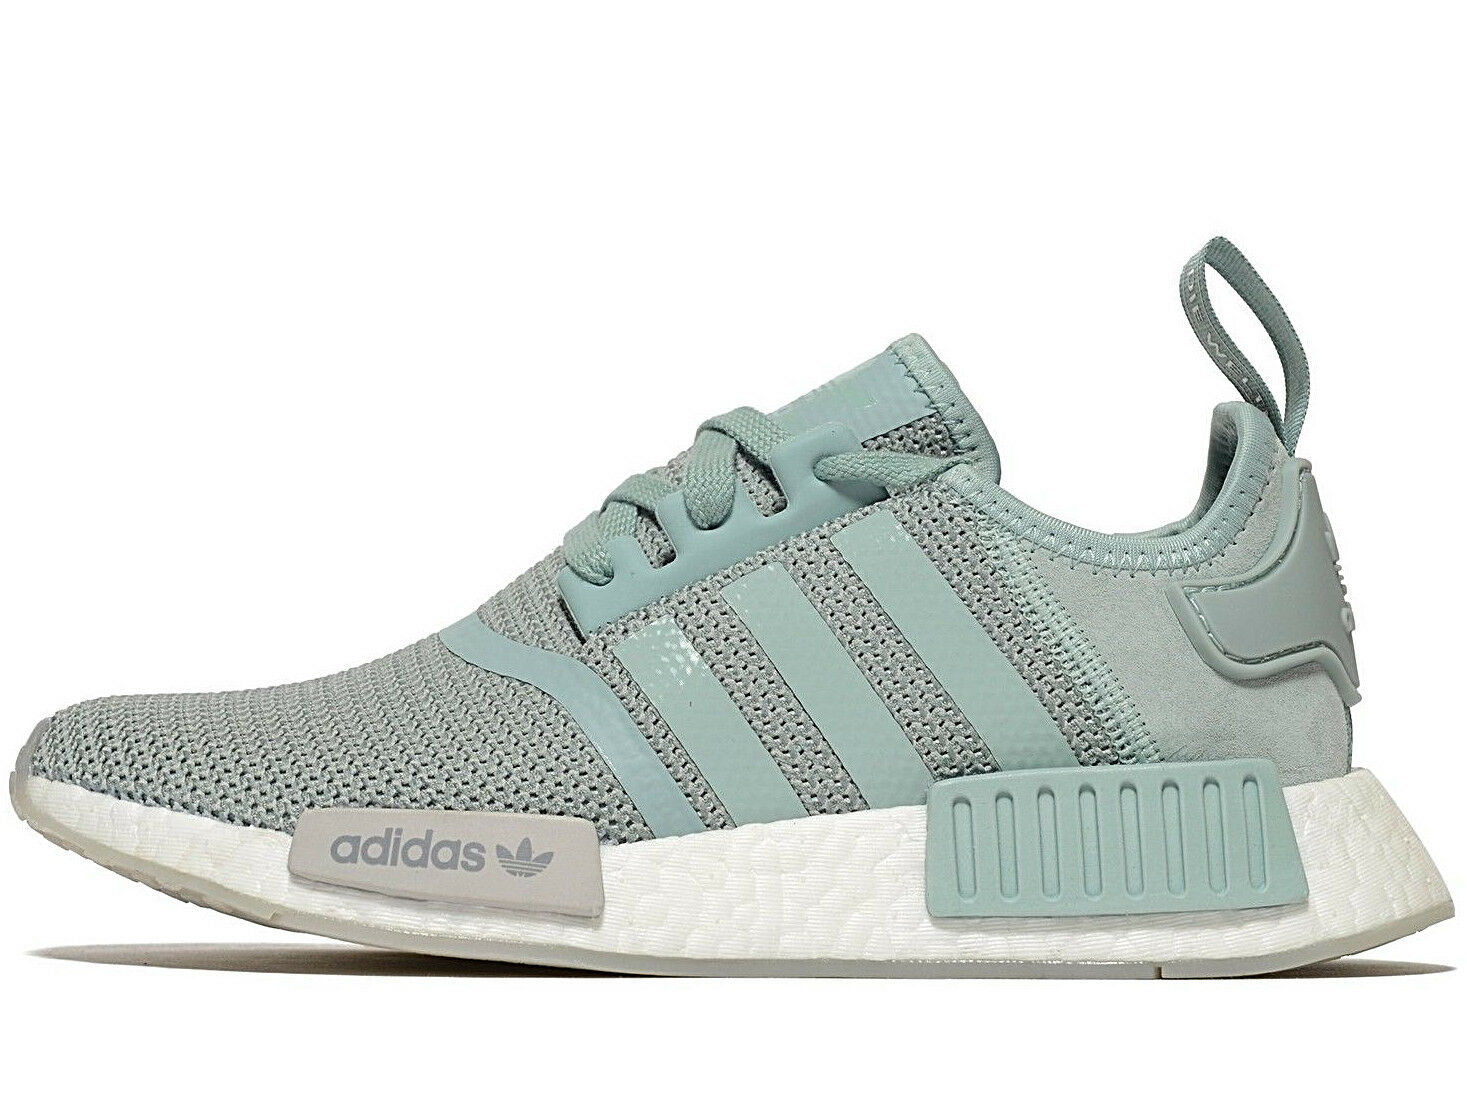 Latest Adidas Originals NMD R1 ® (Größe UK  7 EU 40.5) Teal Grün   grau   Weiß